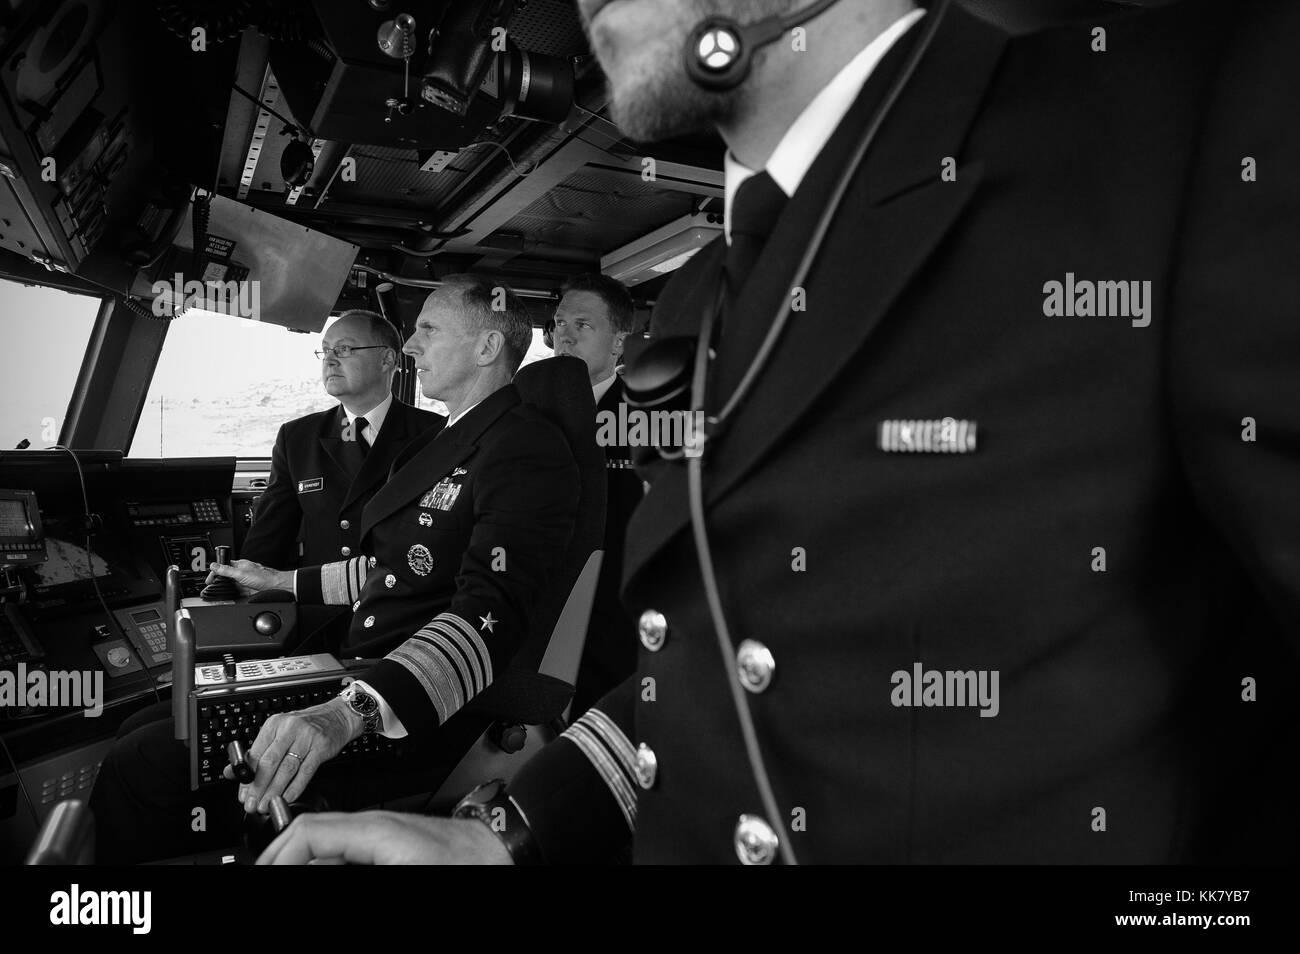 Chief of Naval Operations CNO Admiral Jonathan Greenert pilots the Skjold-class coastal corvette HNoMS Skudd P962 - Stock Image